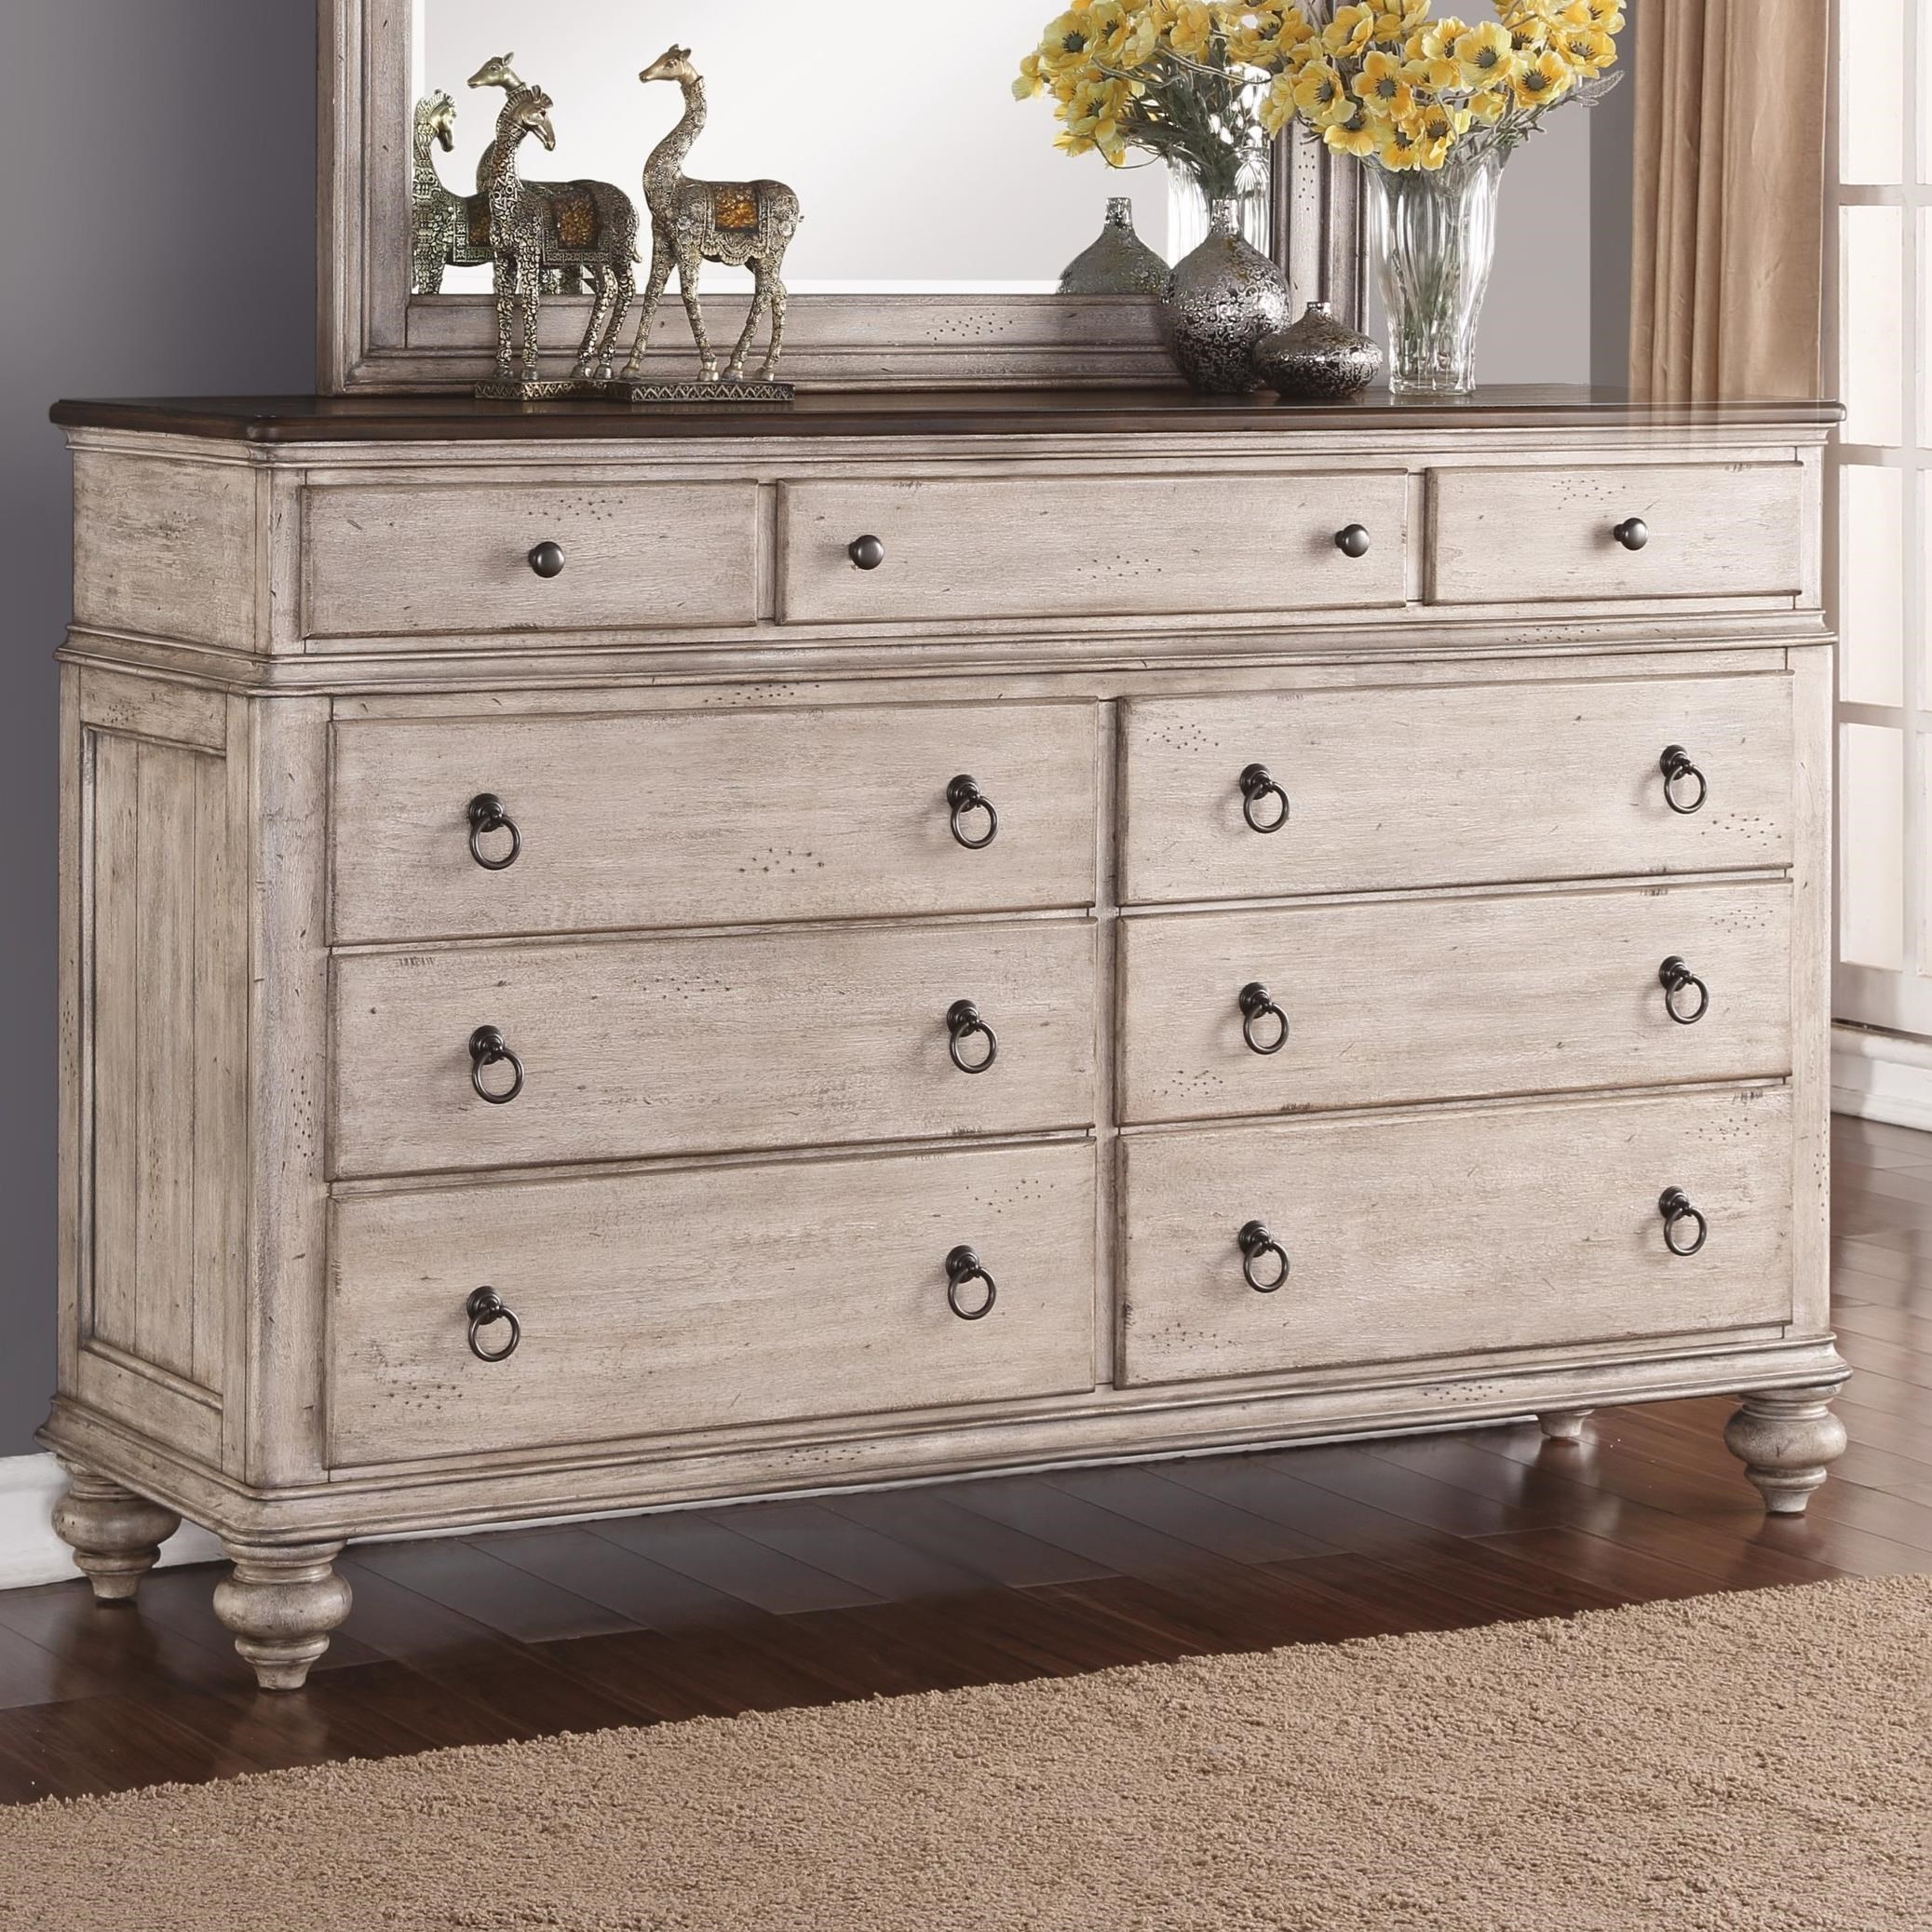 Flexsteel Wynwood Collection Plymouth Cottage 9 Drawer Dresser With False Bottom Drawer Darvin